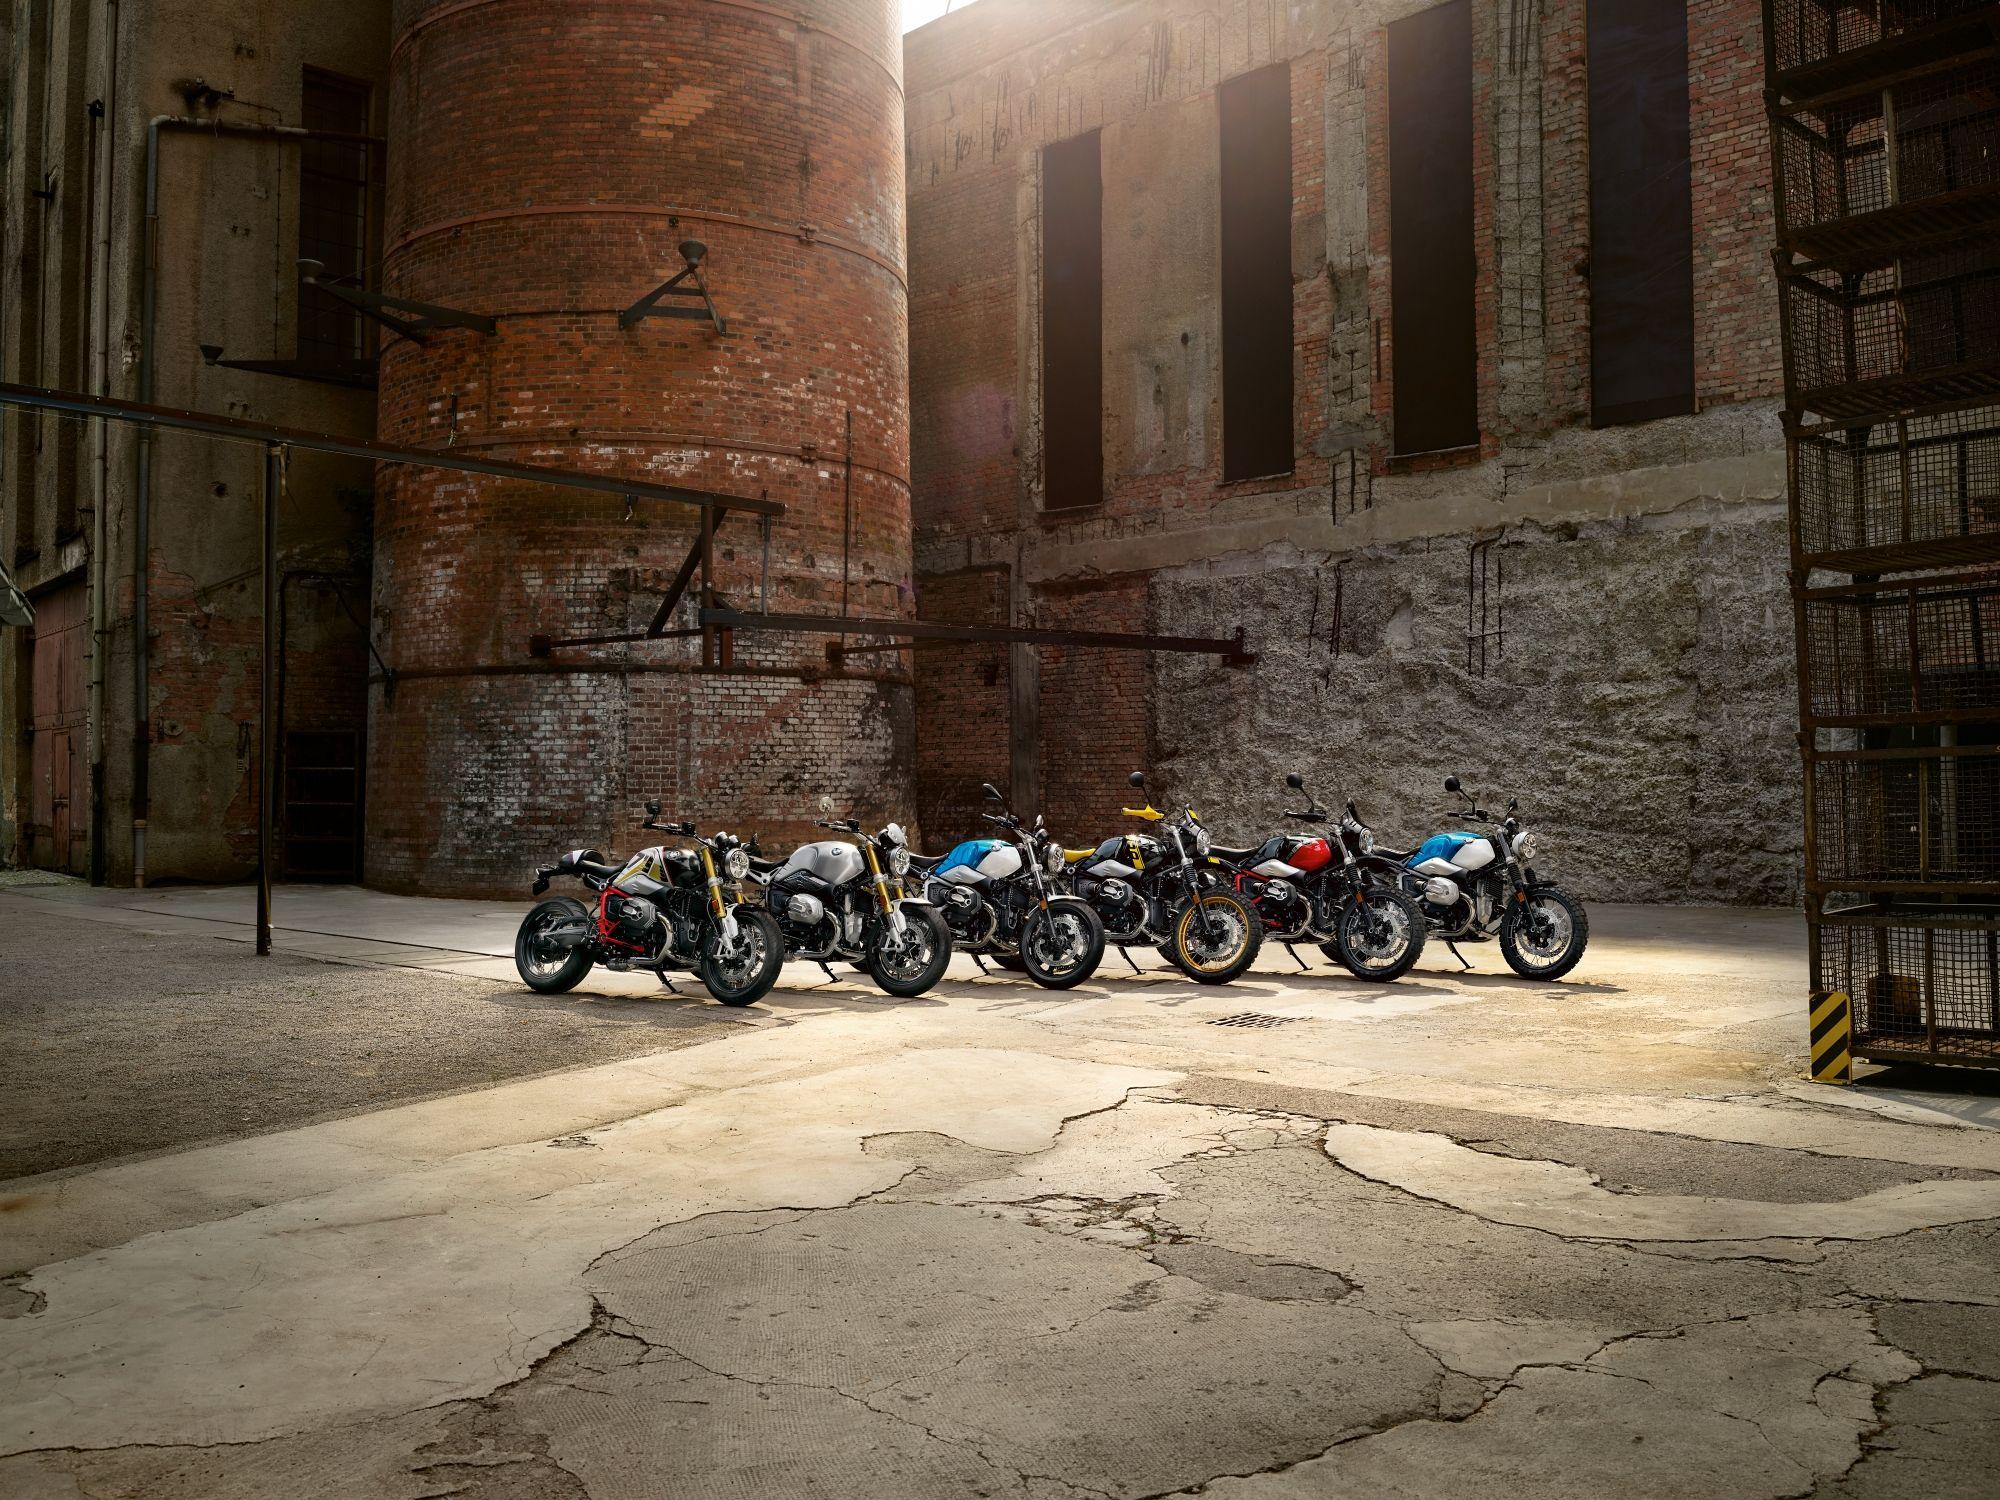 Nieuwe BMW R NineT modellen, af-fabriek ook als A2 leverbaar!